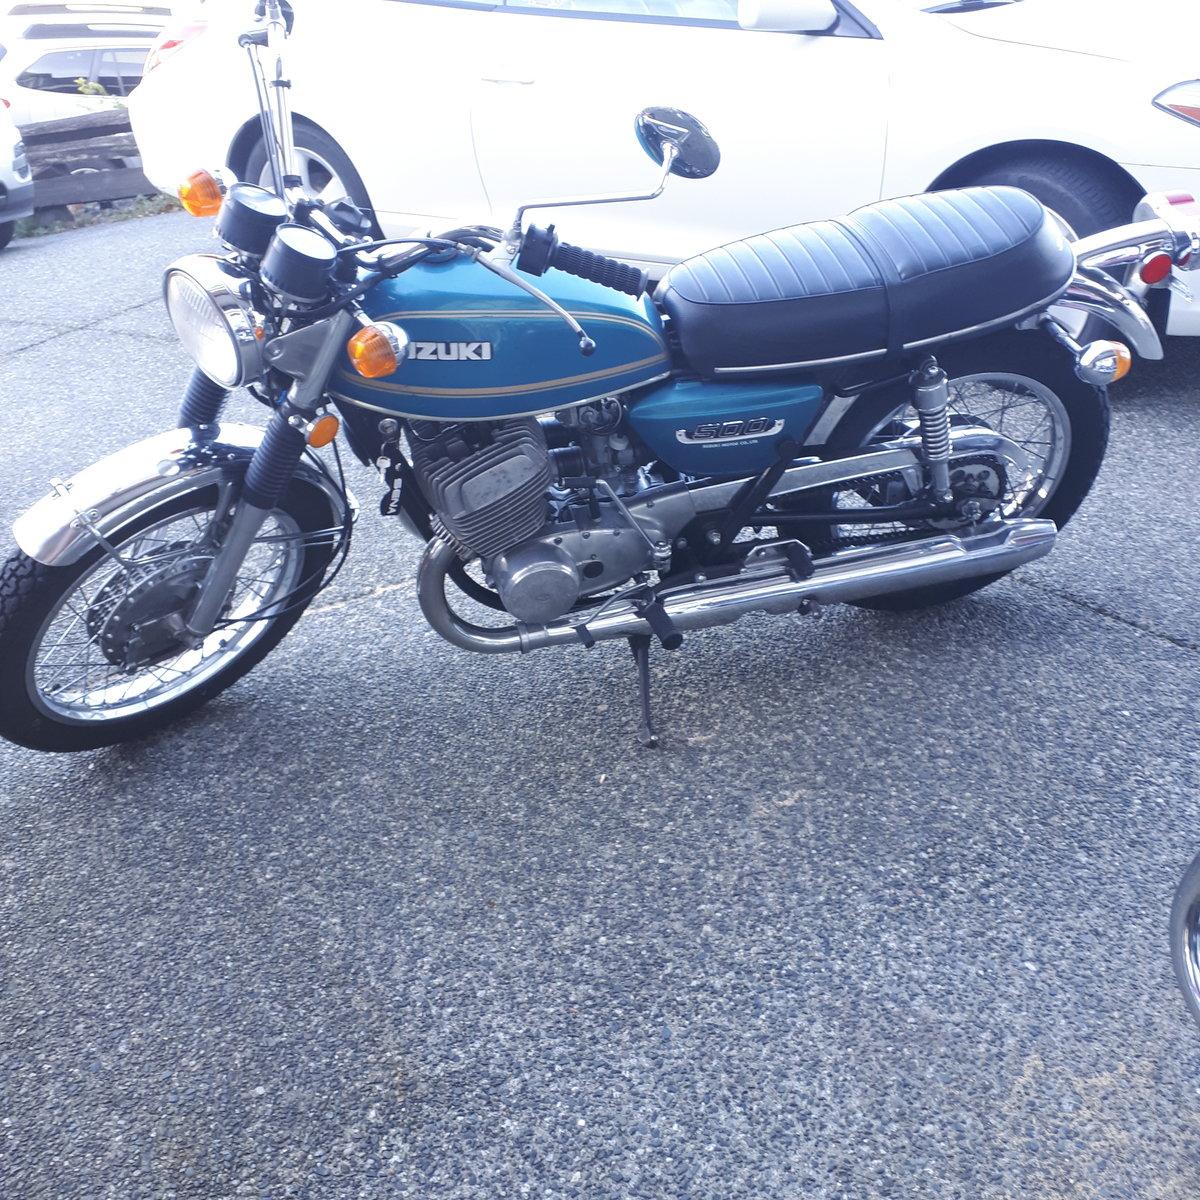 1975 Titan 500 Original condition, BITCOIN accepted For Sale (picture 2 of 3)